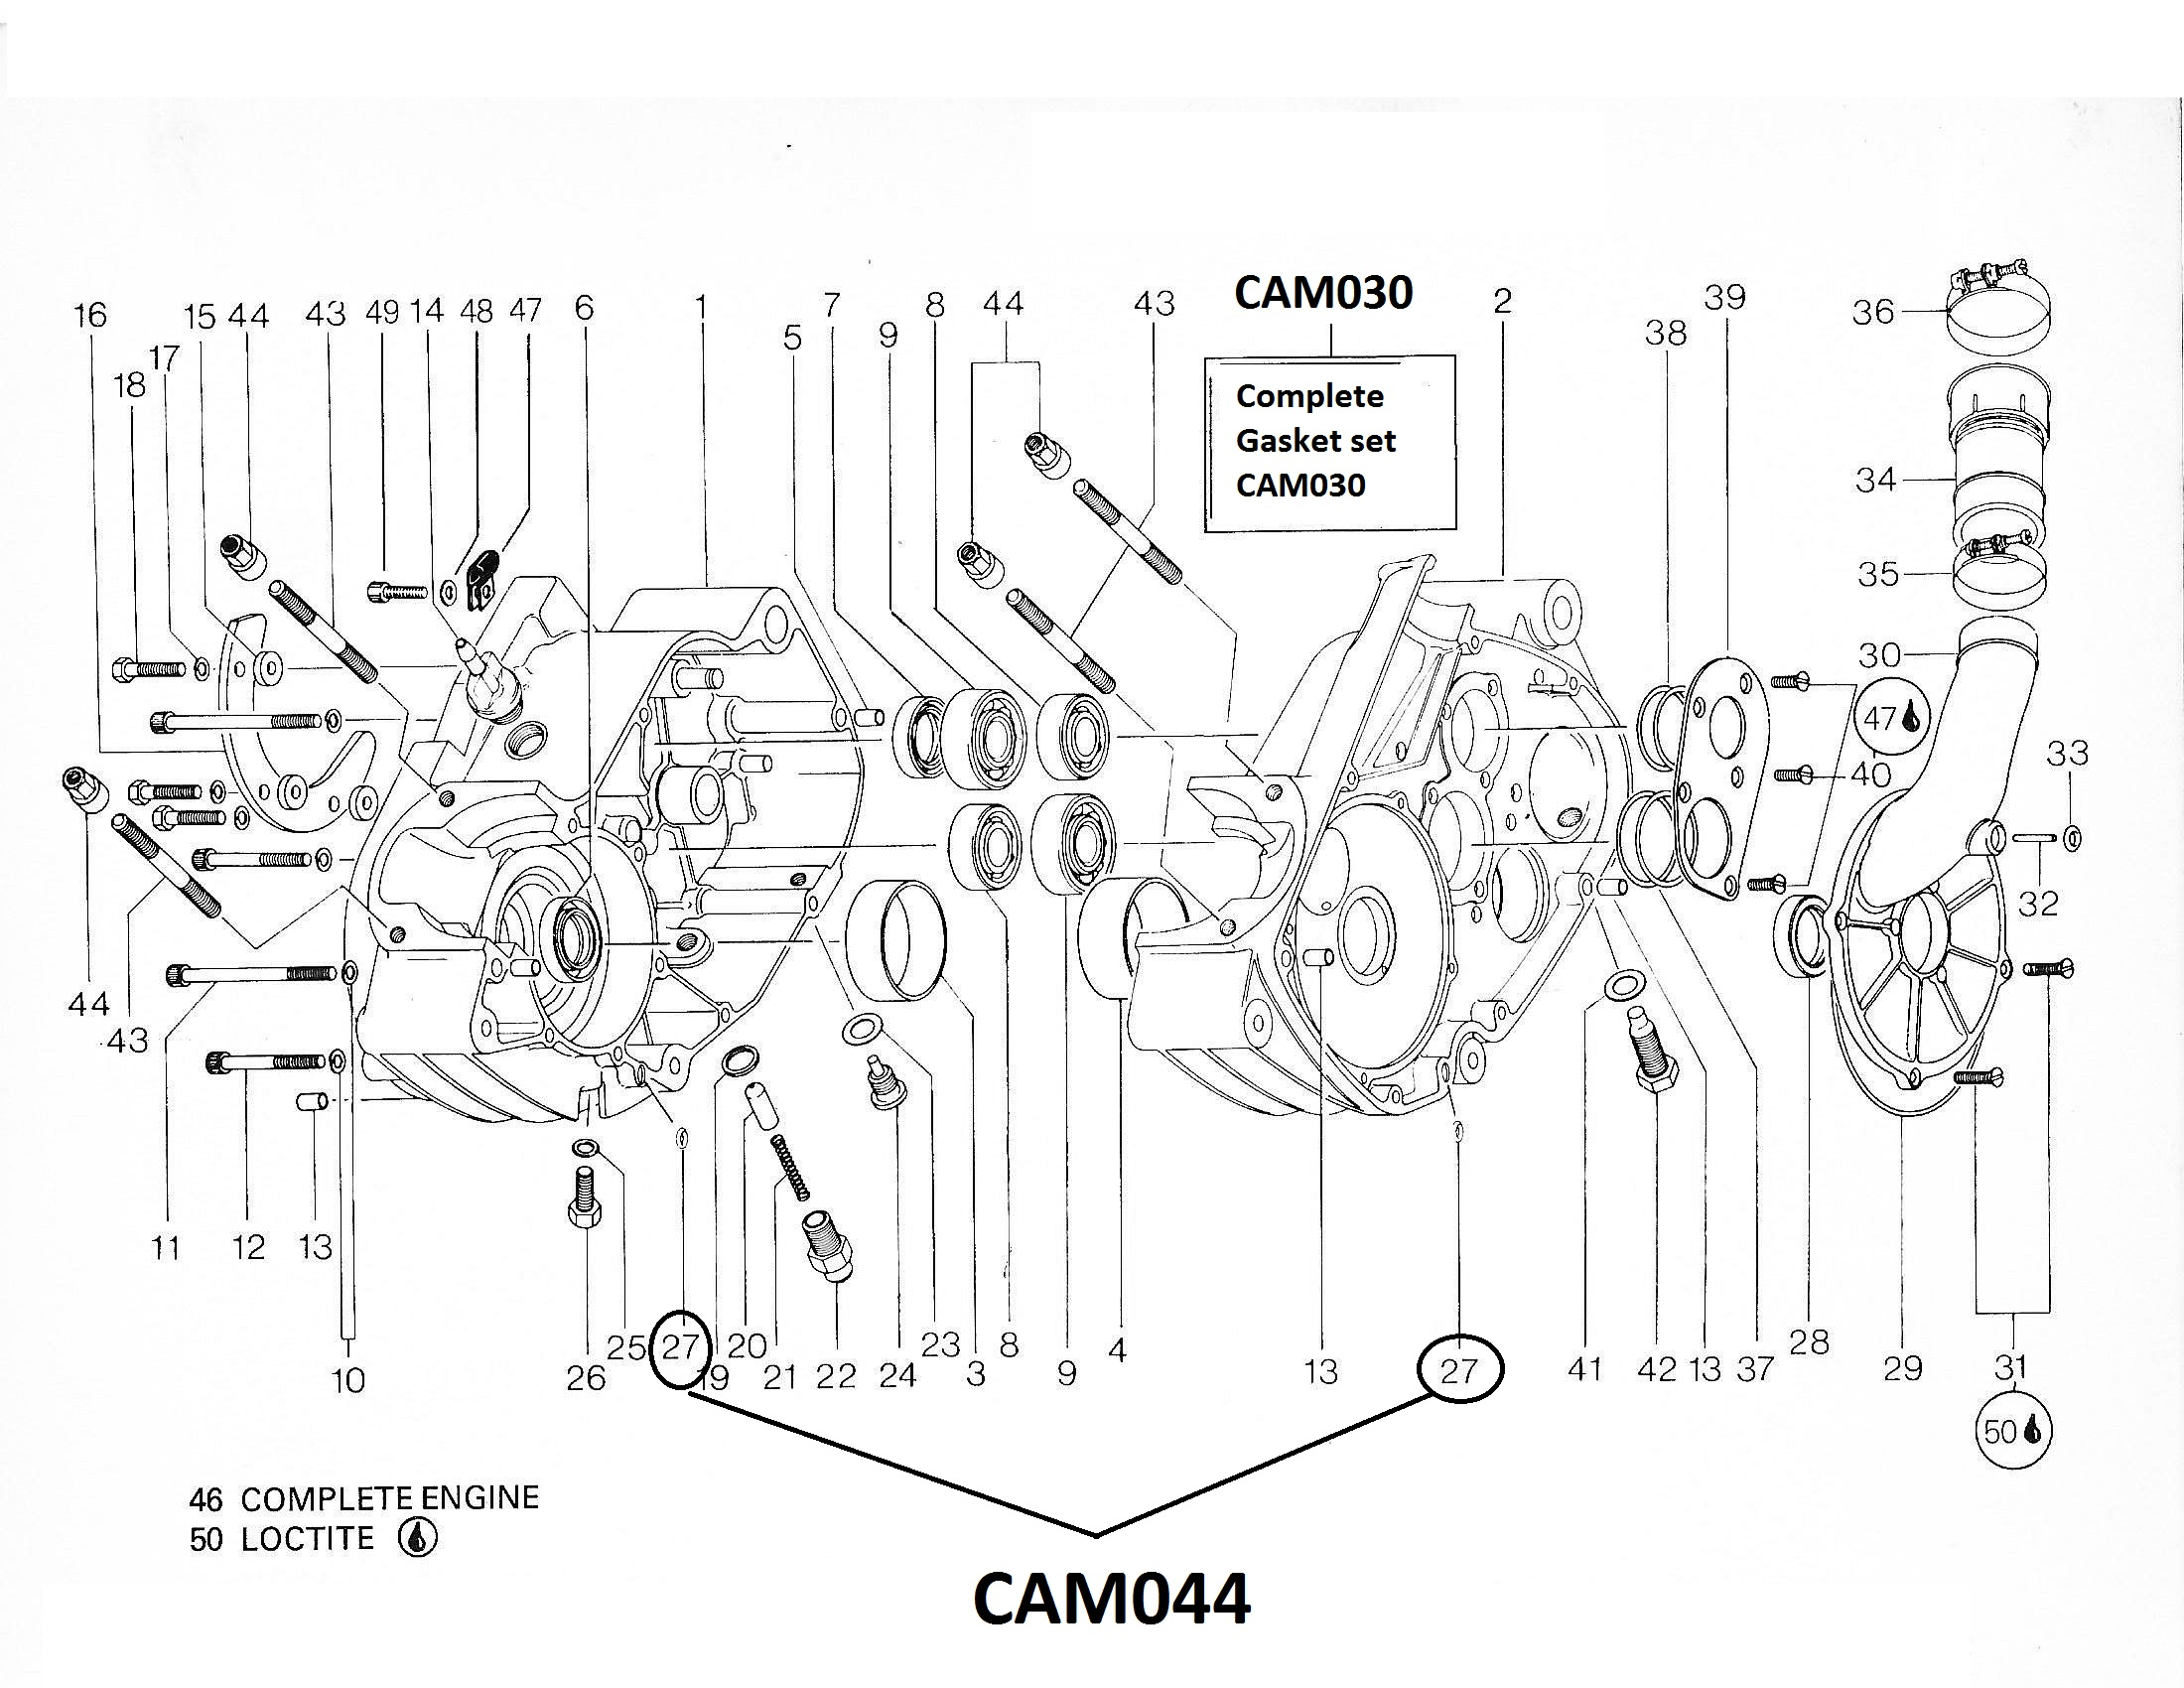 Cam044 Oil Injection Transfert O Ring